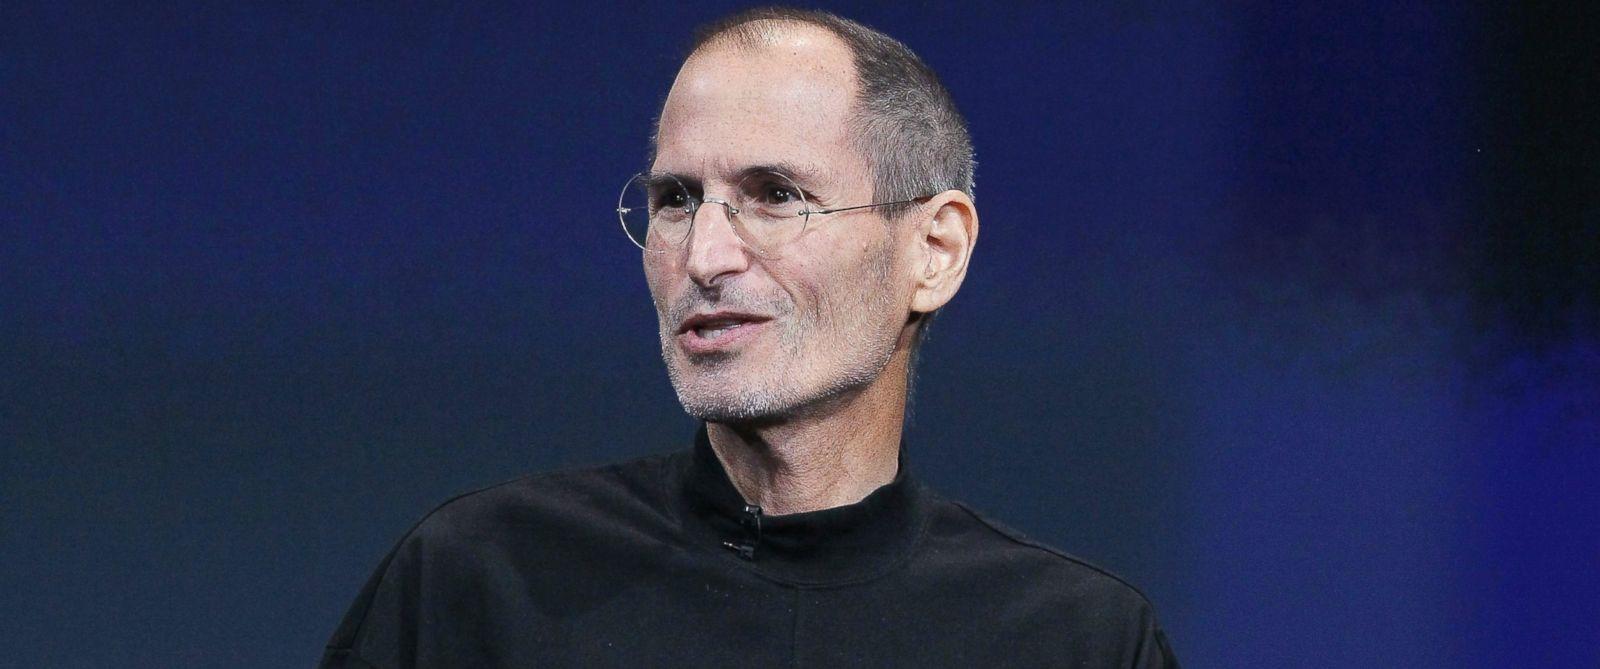 Michael Fassbender Steve Jobs Comparison